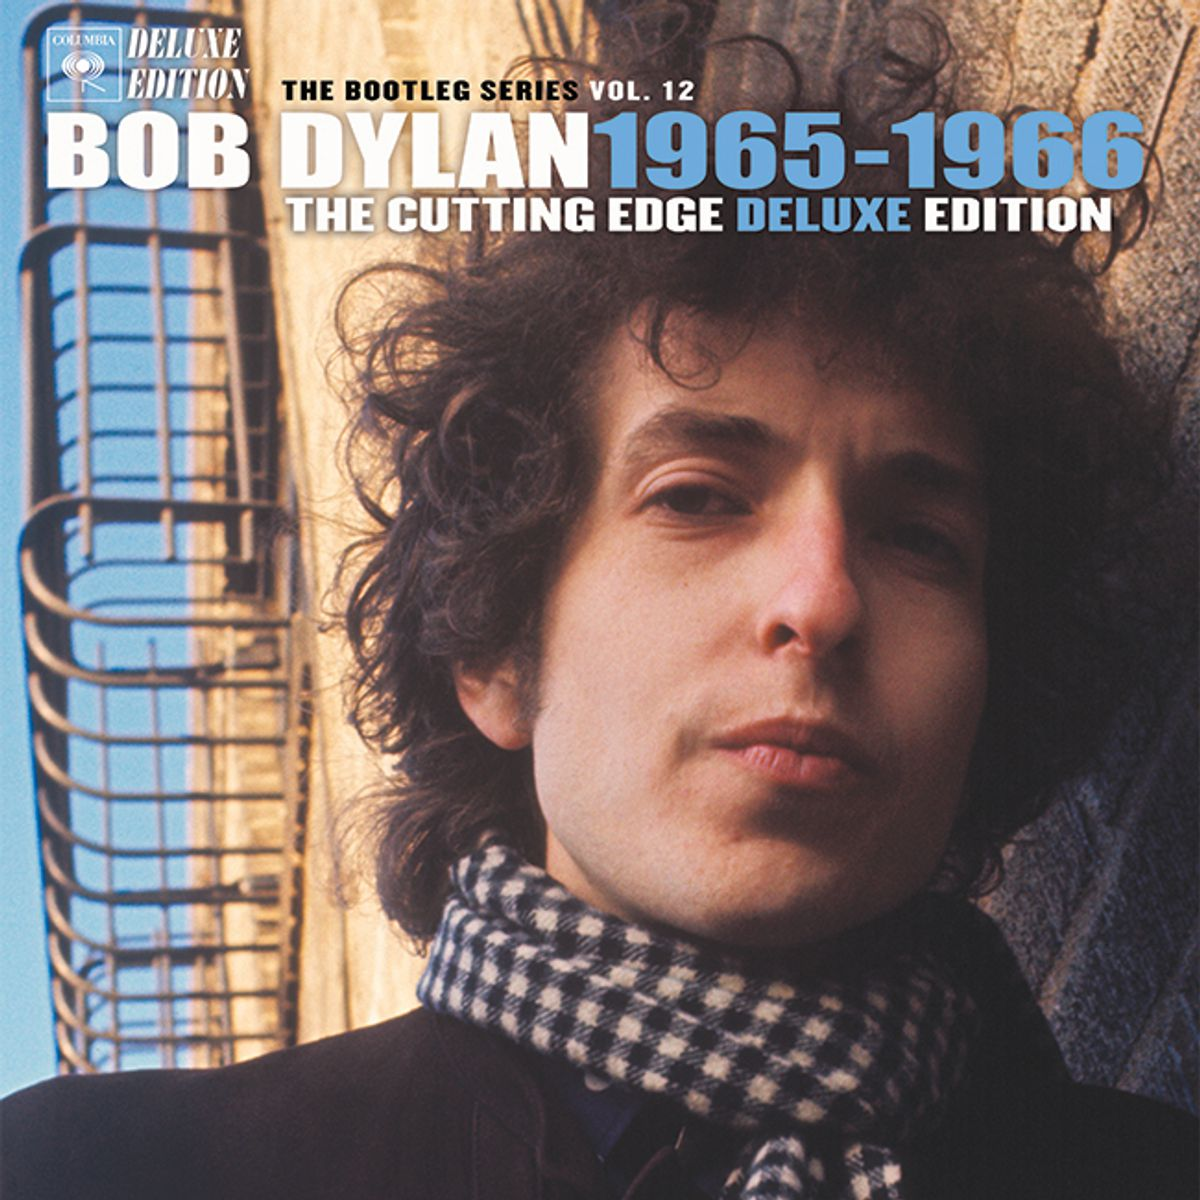 Bob Dylan - The Cutting Edge 1965-1966. The Bootleg Series Vol. 12